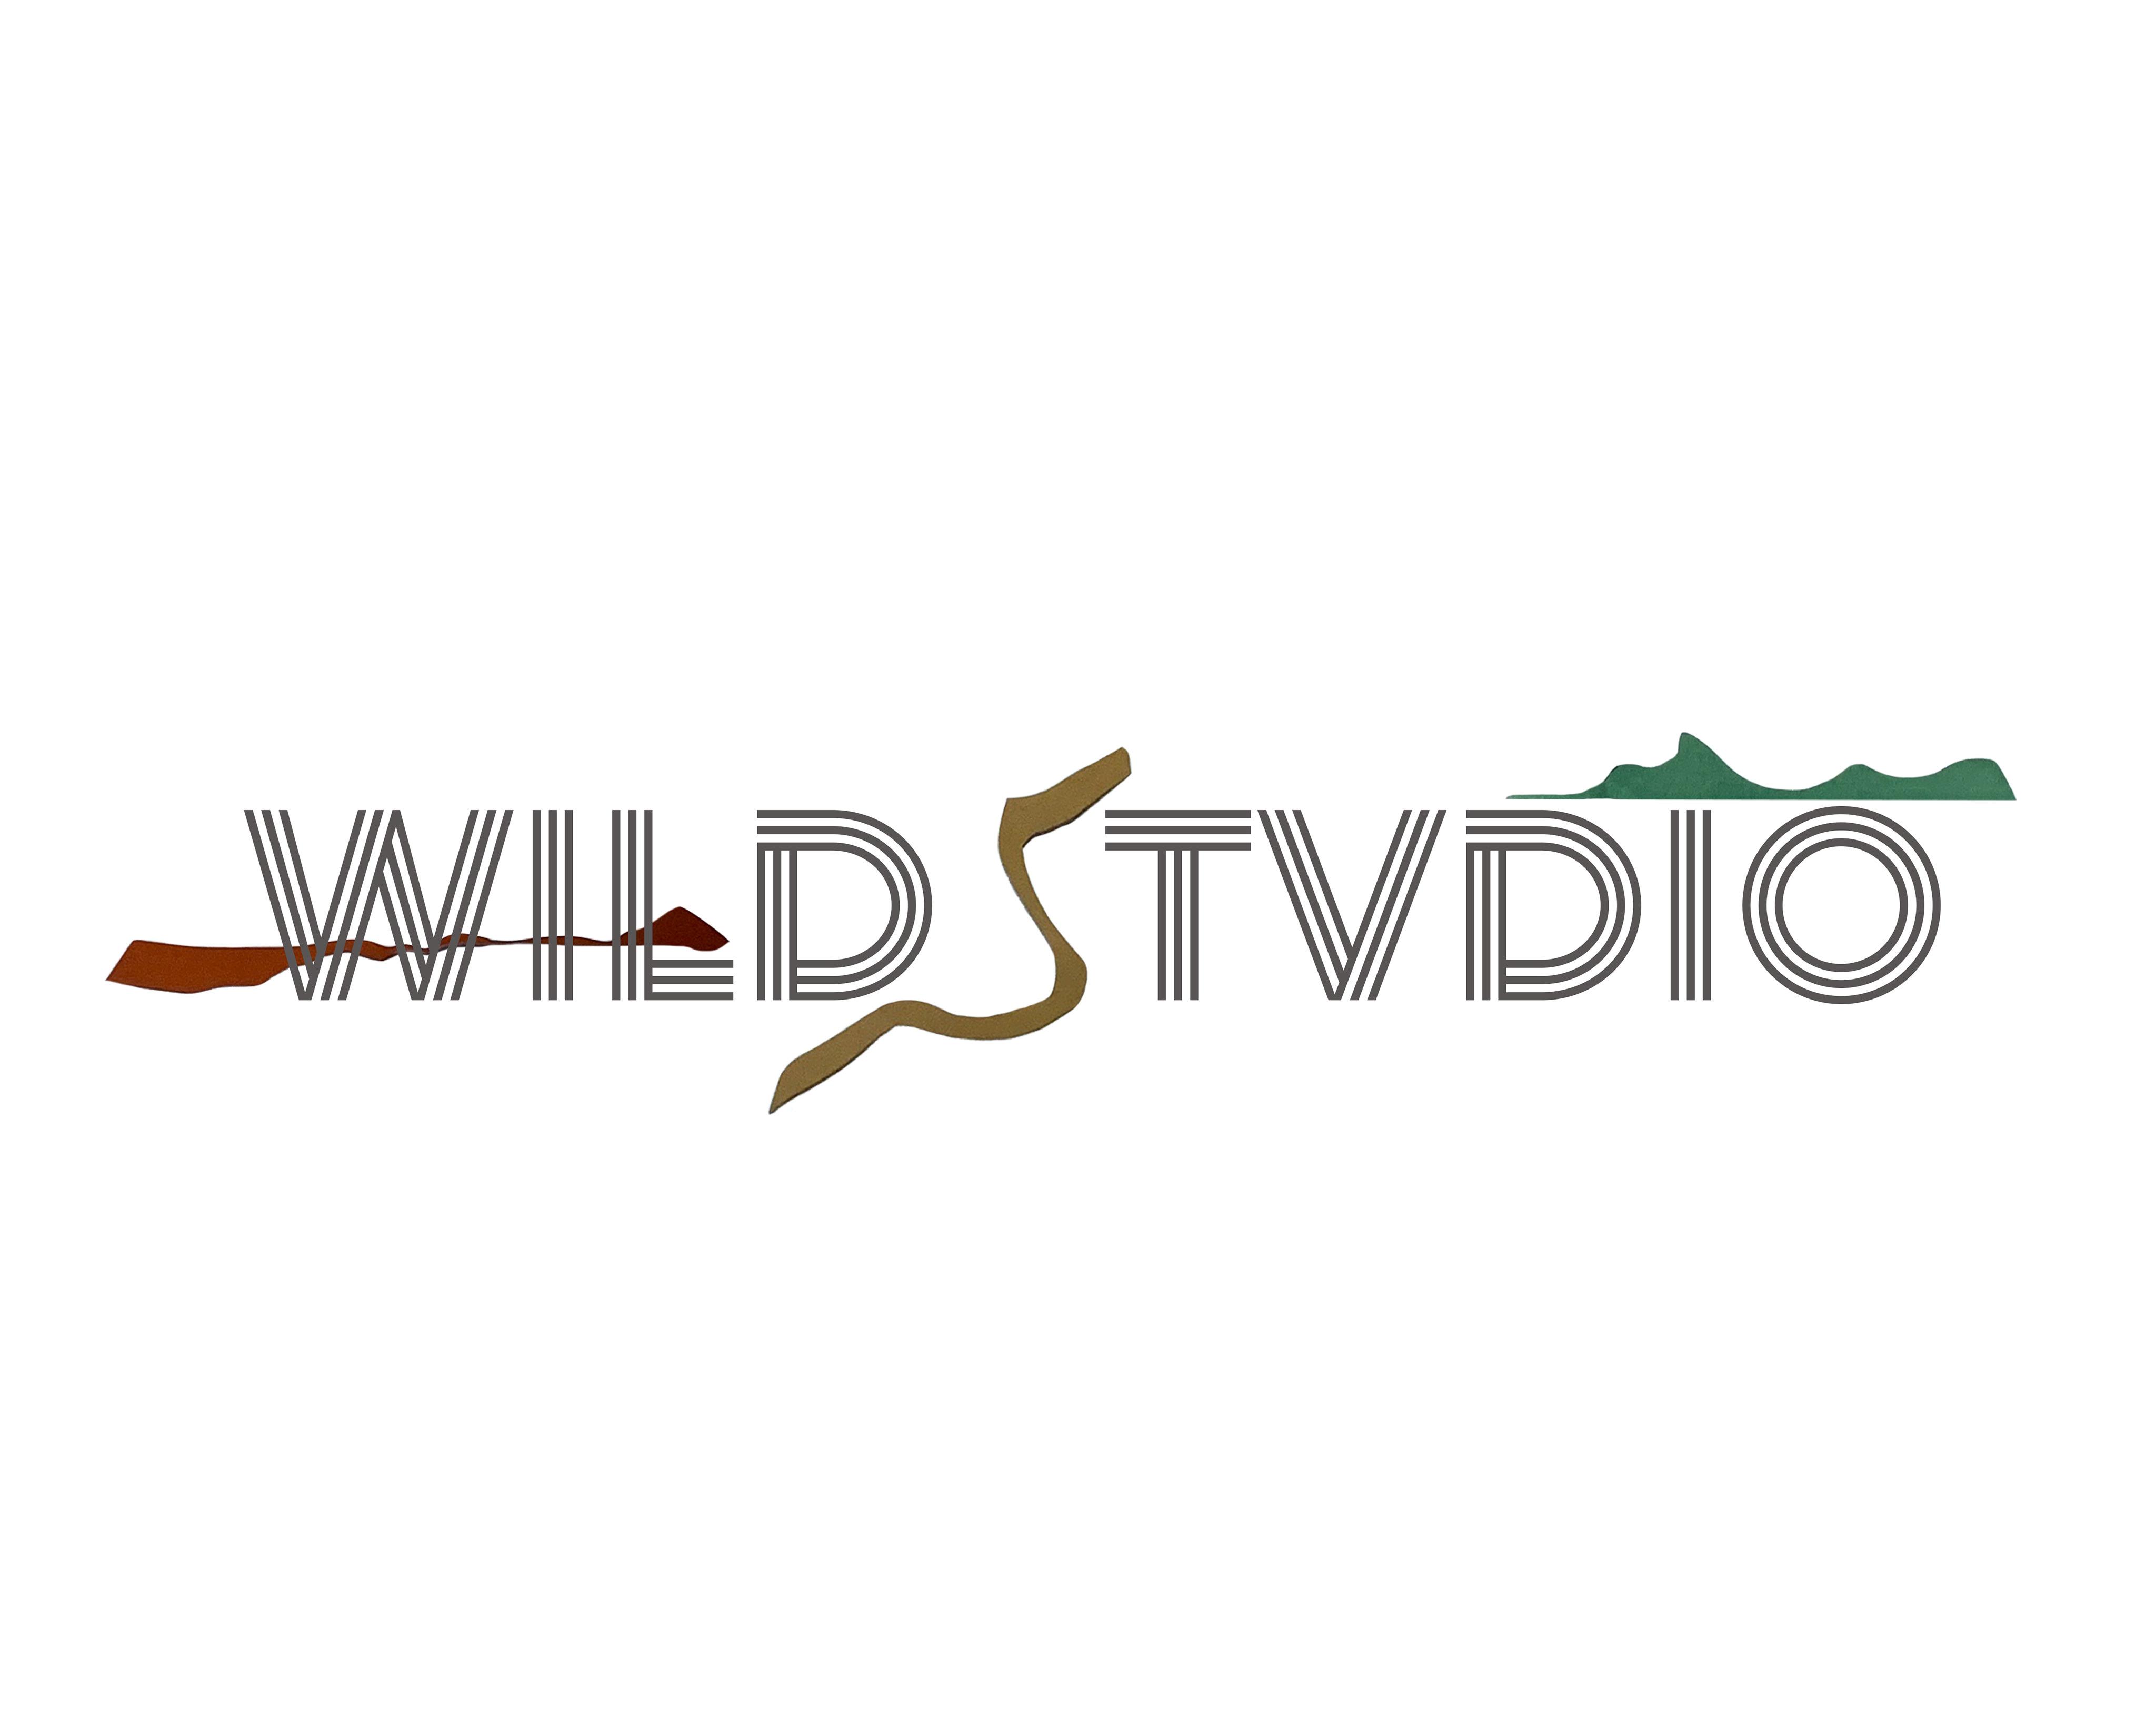 WILDSTVDIO